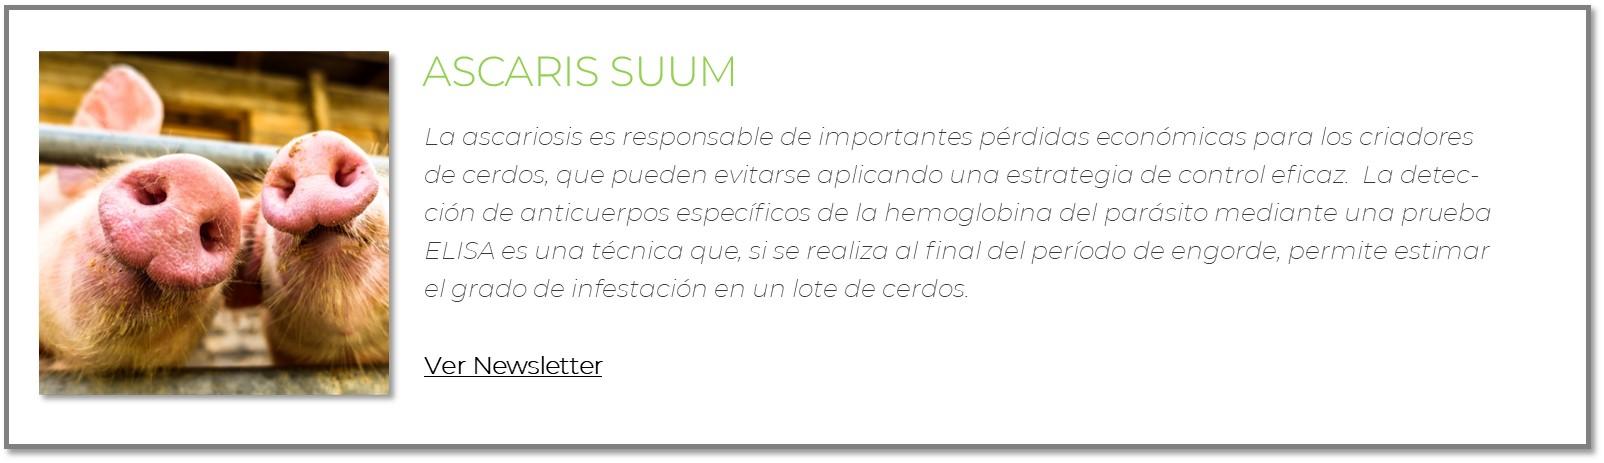 Newsletter_Ascaris_Web.jpg